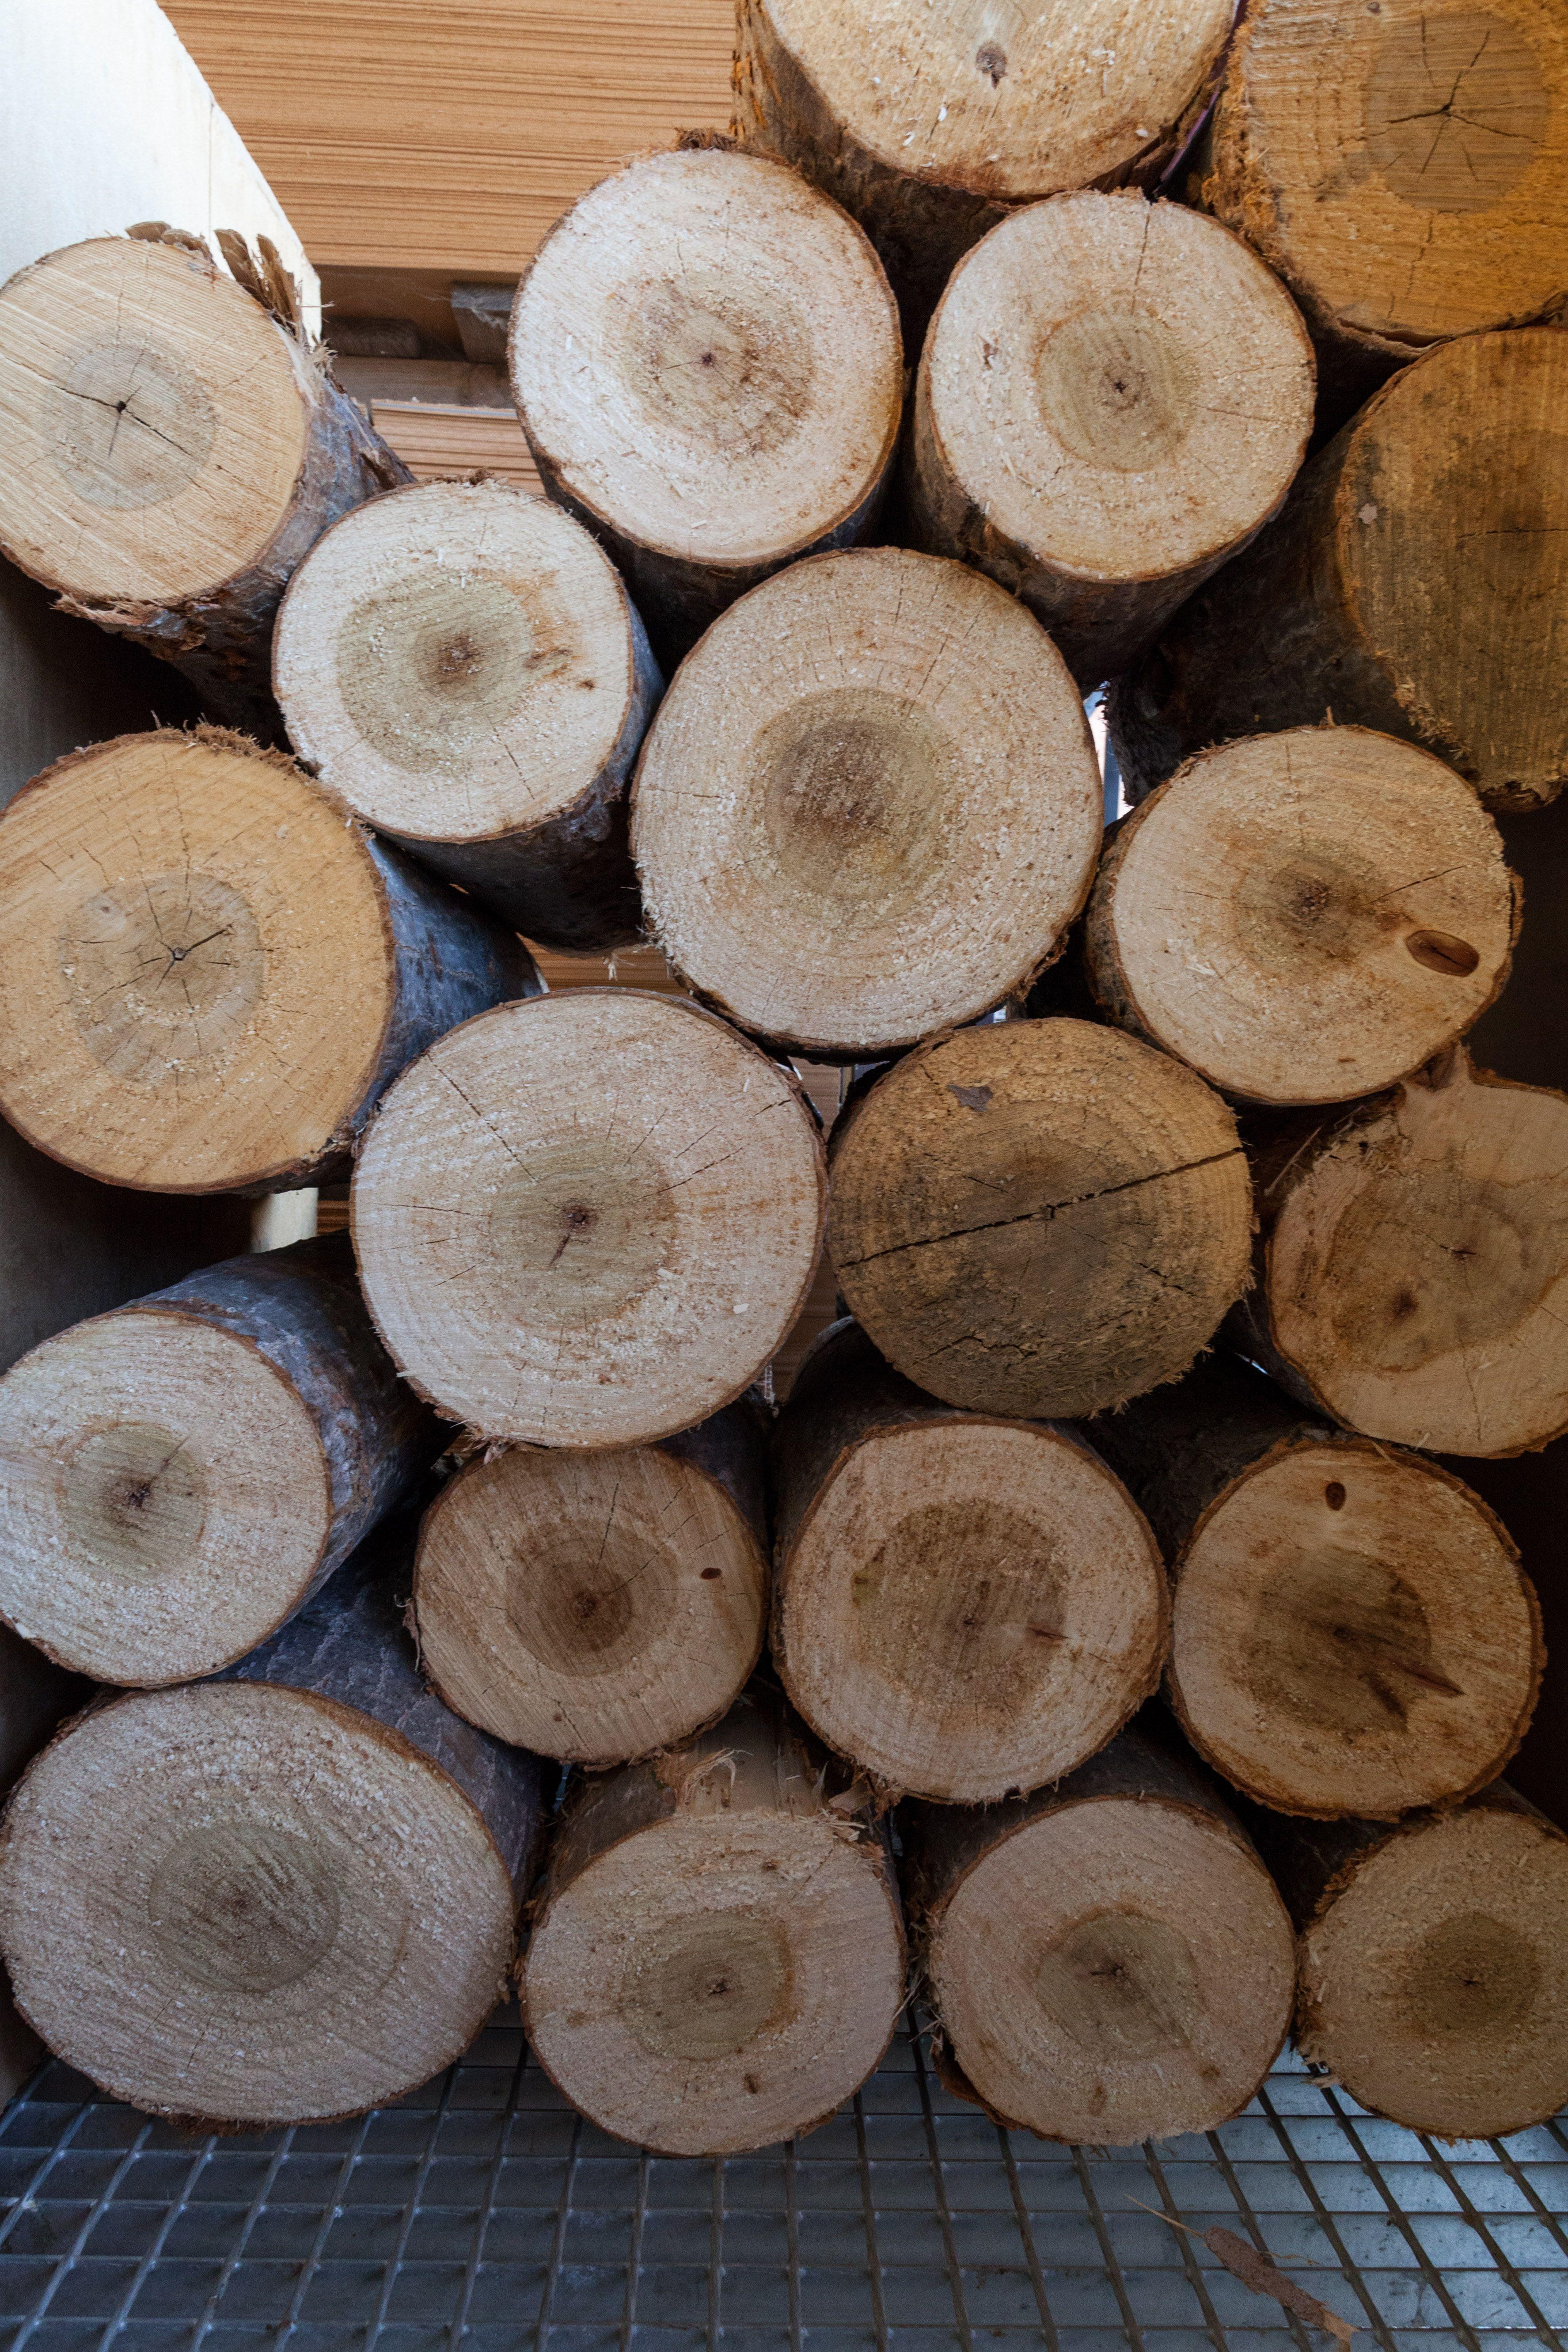 Cajas de madera para hortalizas